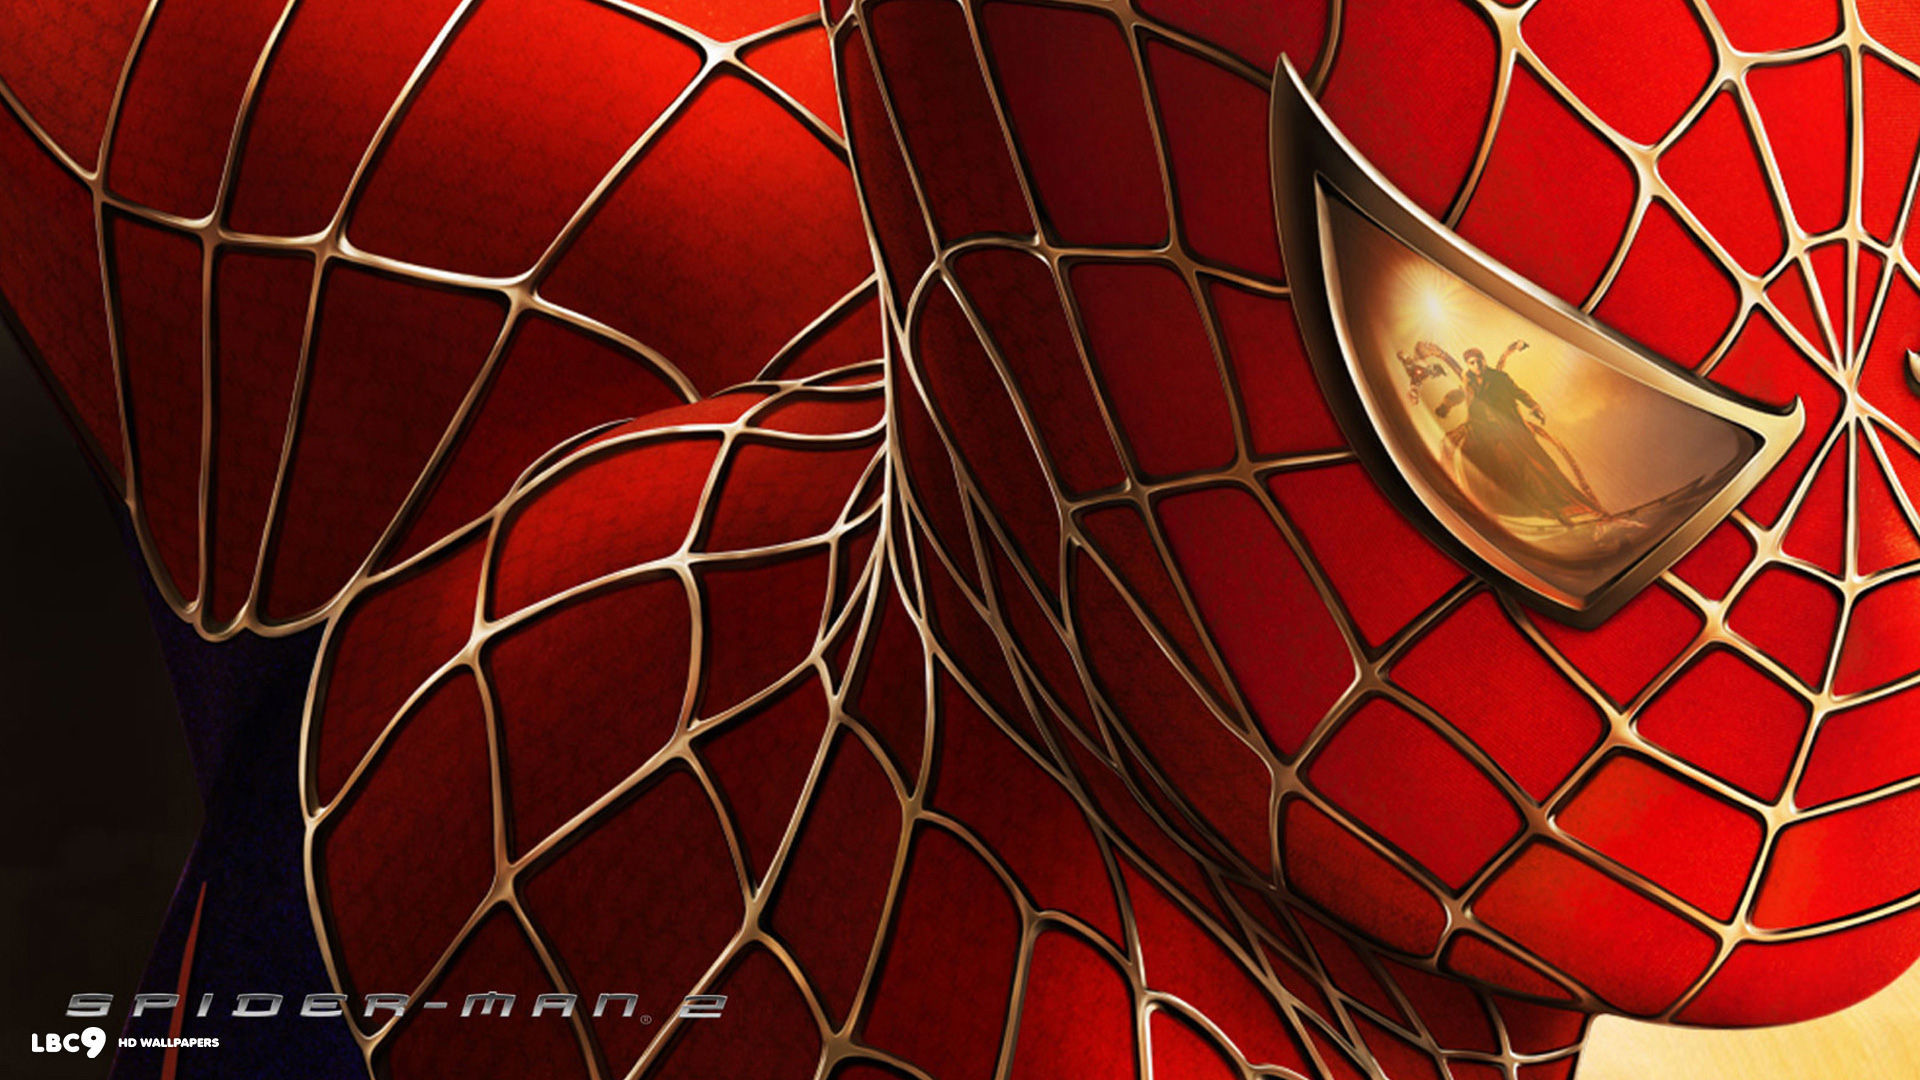 Spiderman neon red wallpaper wallpapertag - Spider man 3 wallpaper 1080p ...